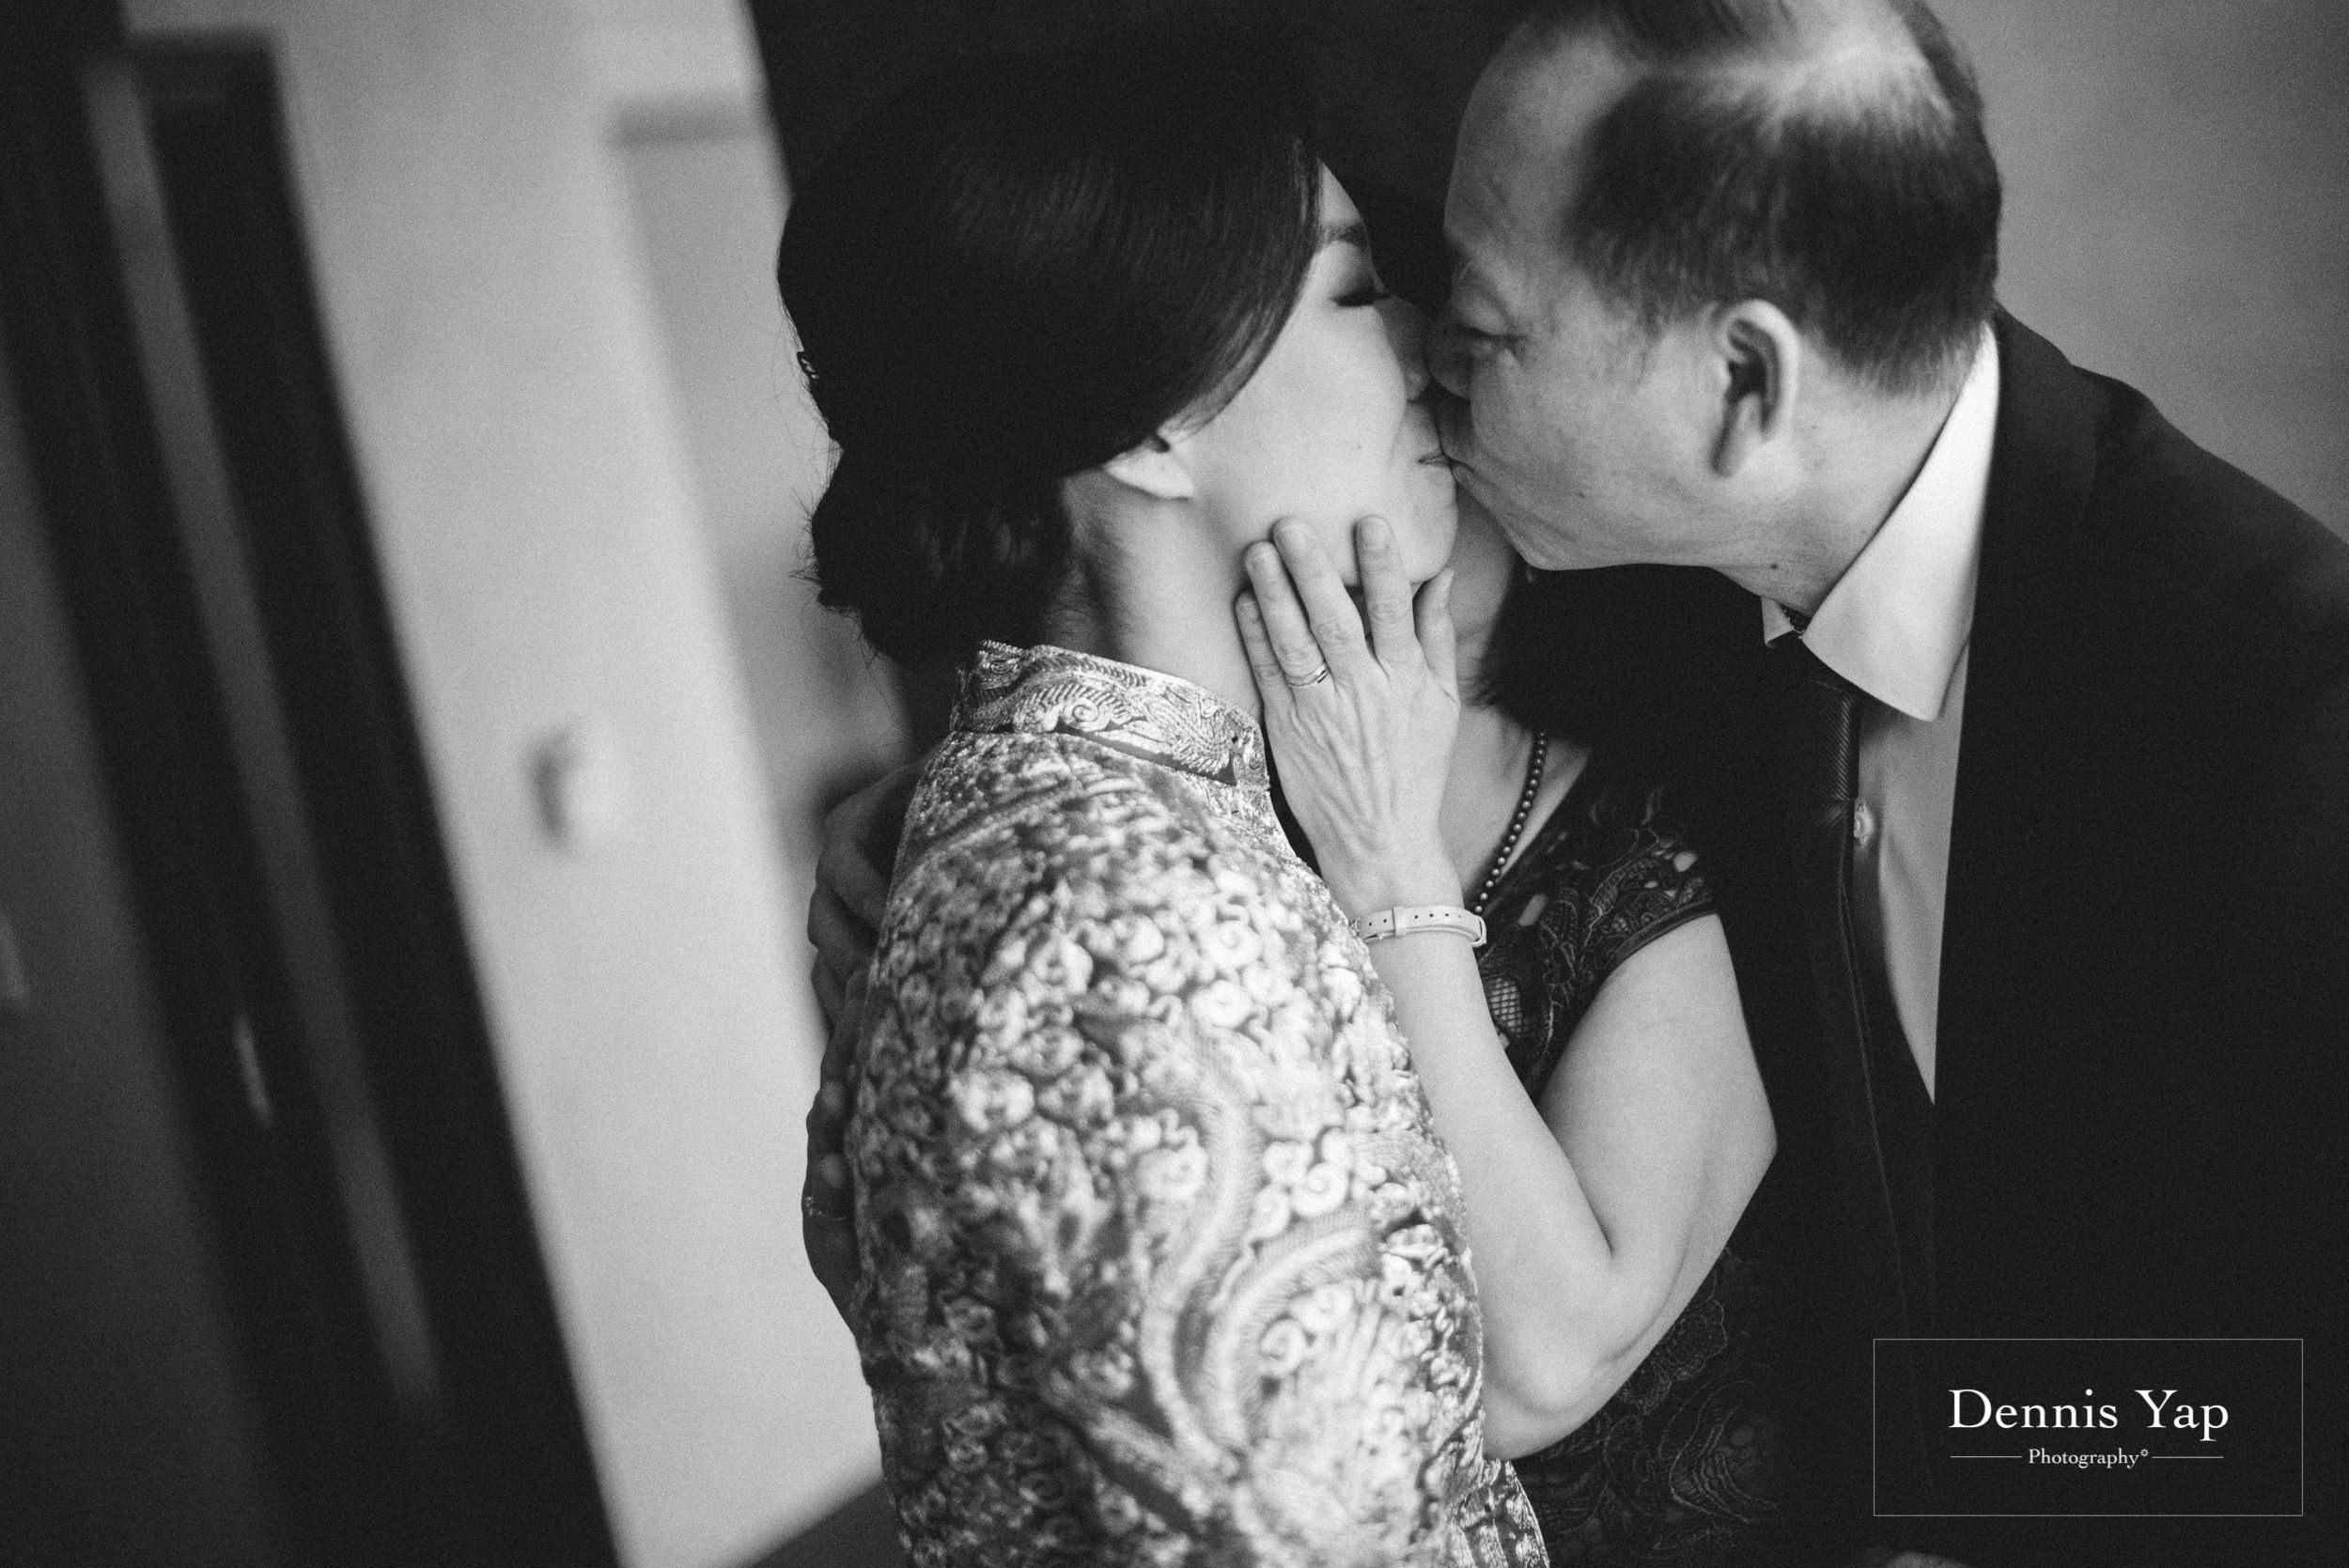 wai keong jenny wedding day bangsar dennis yap photography emotions beloved family-7.jpg